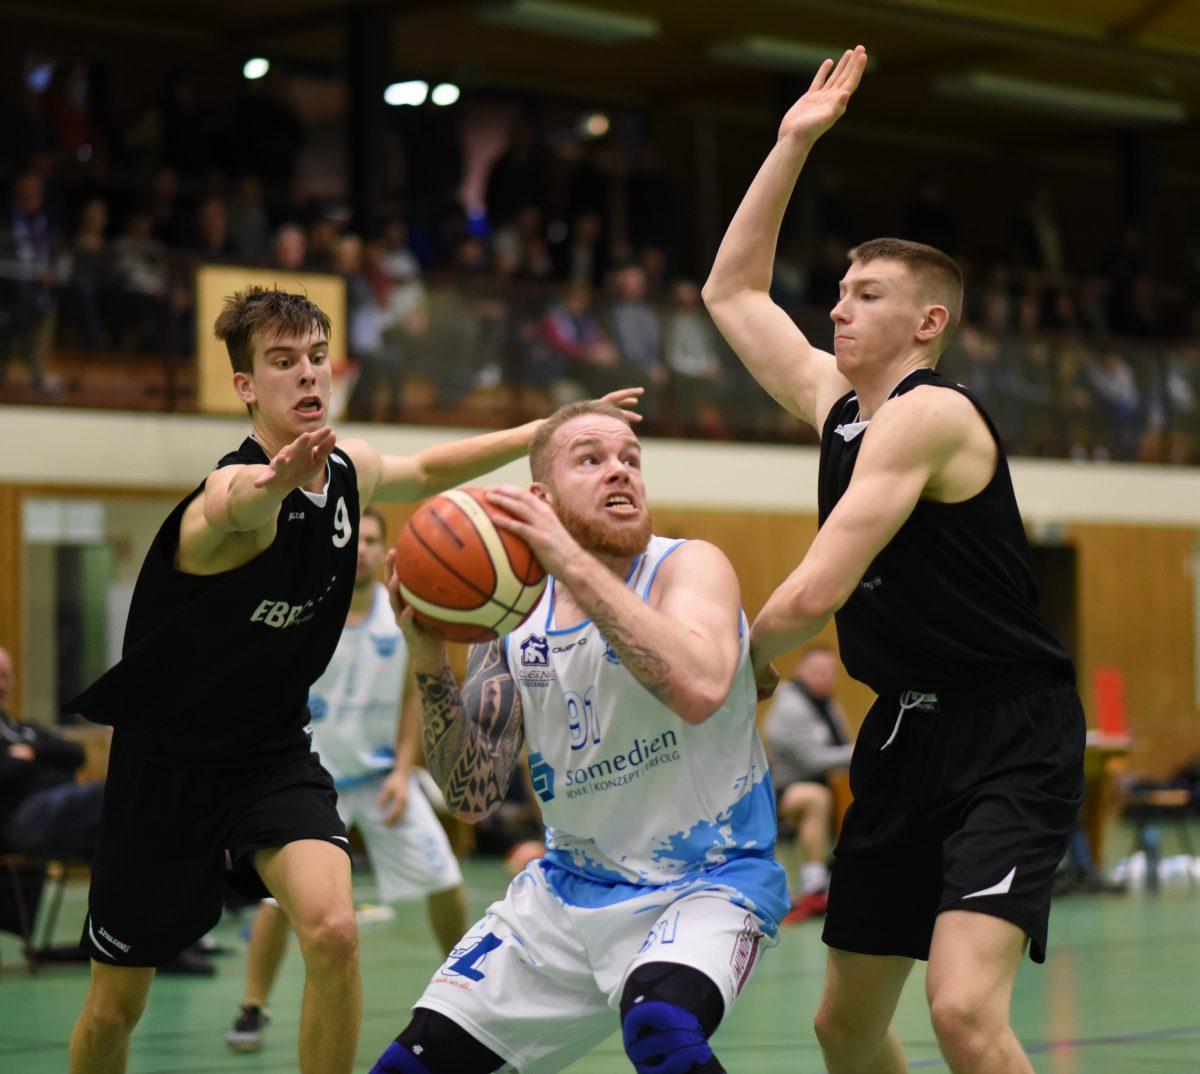 89:80 – S.O. Medien Baskets feiert gegen TK Hannover Meilenstein in Richtung Klassenerhalt